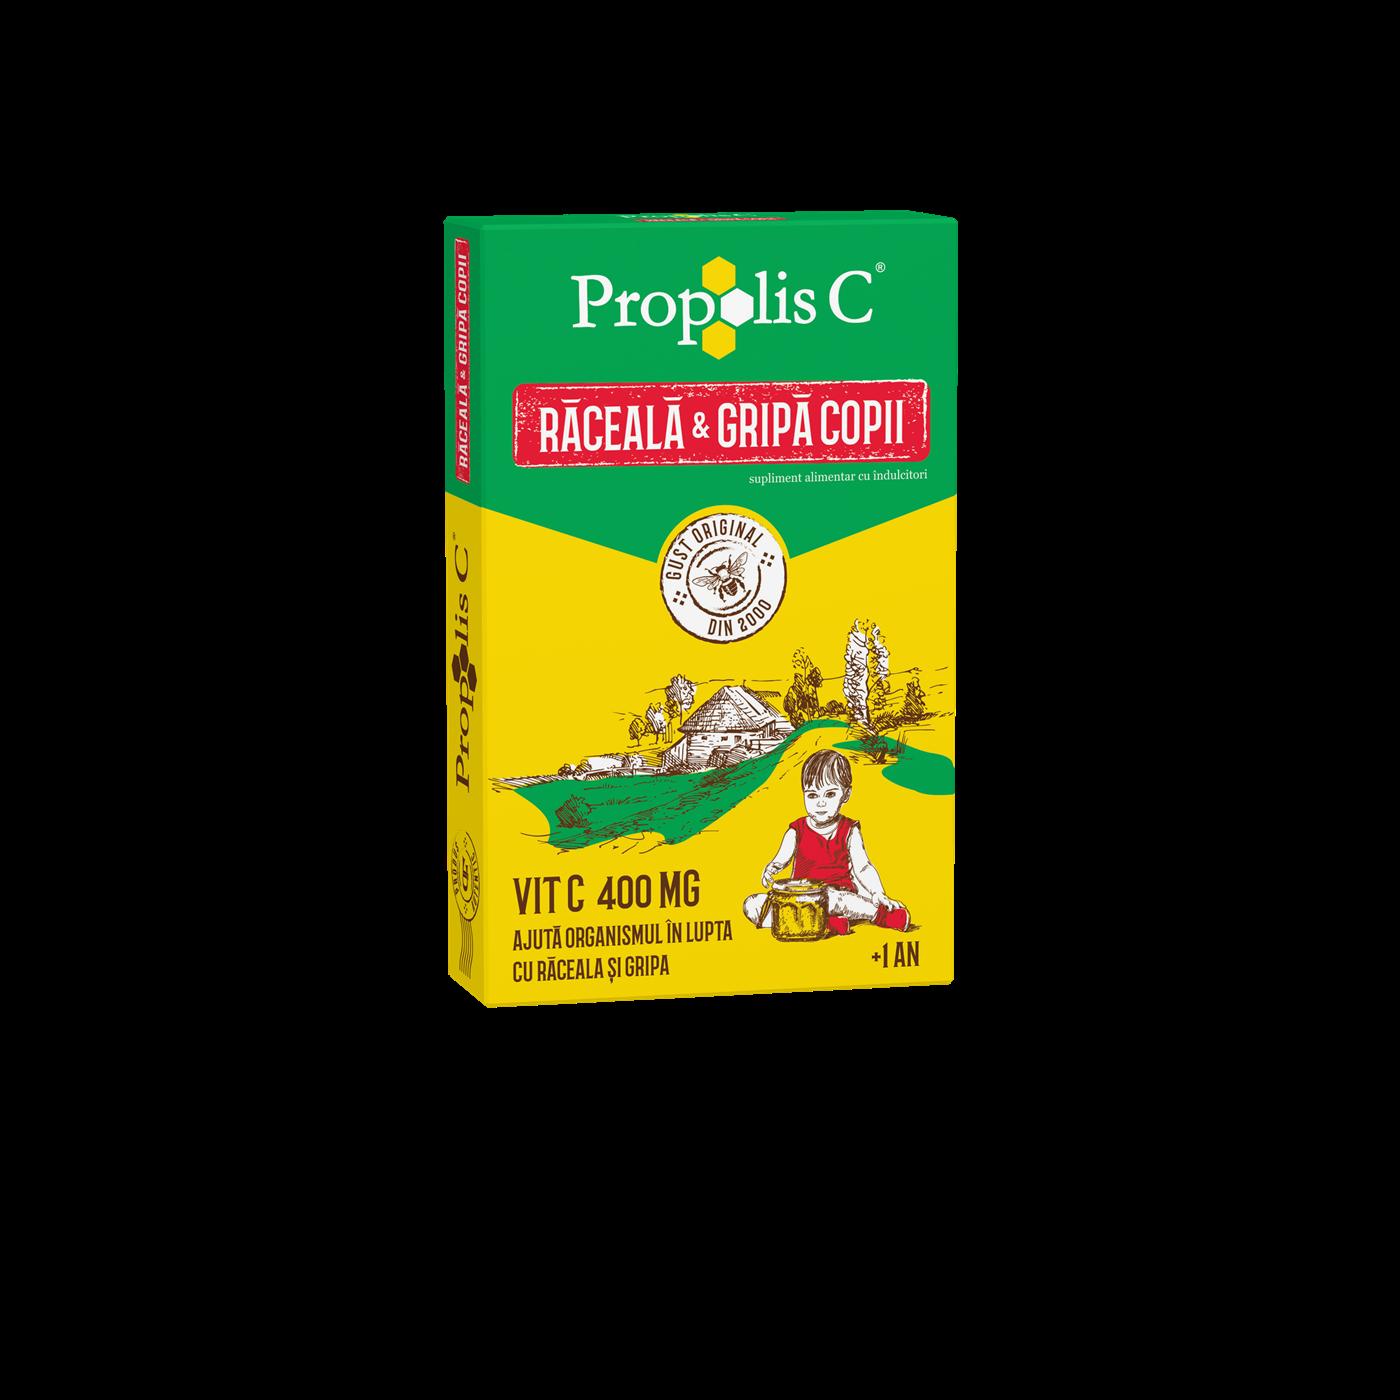 Propolis C Raceala & Gripa